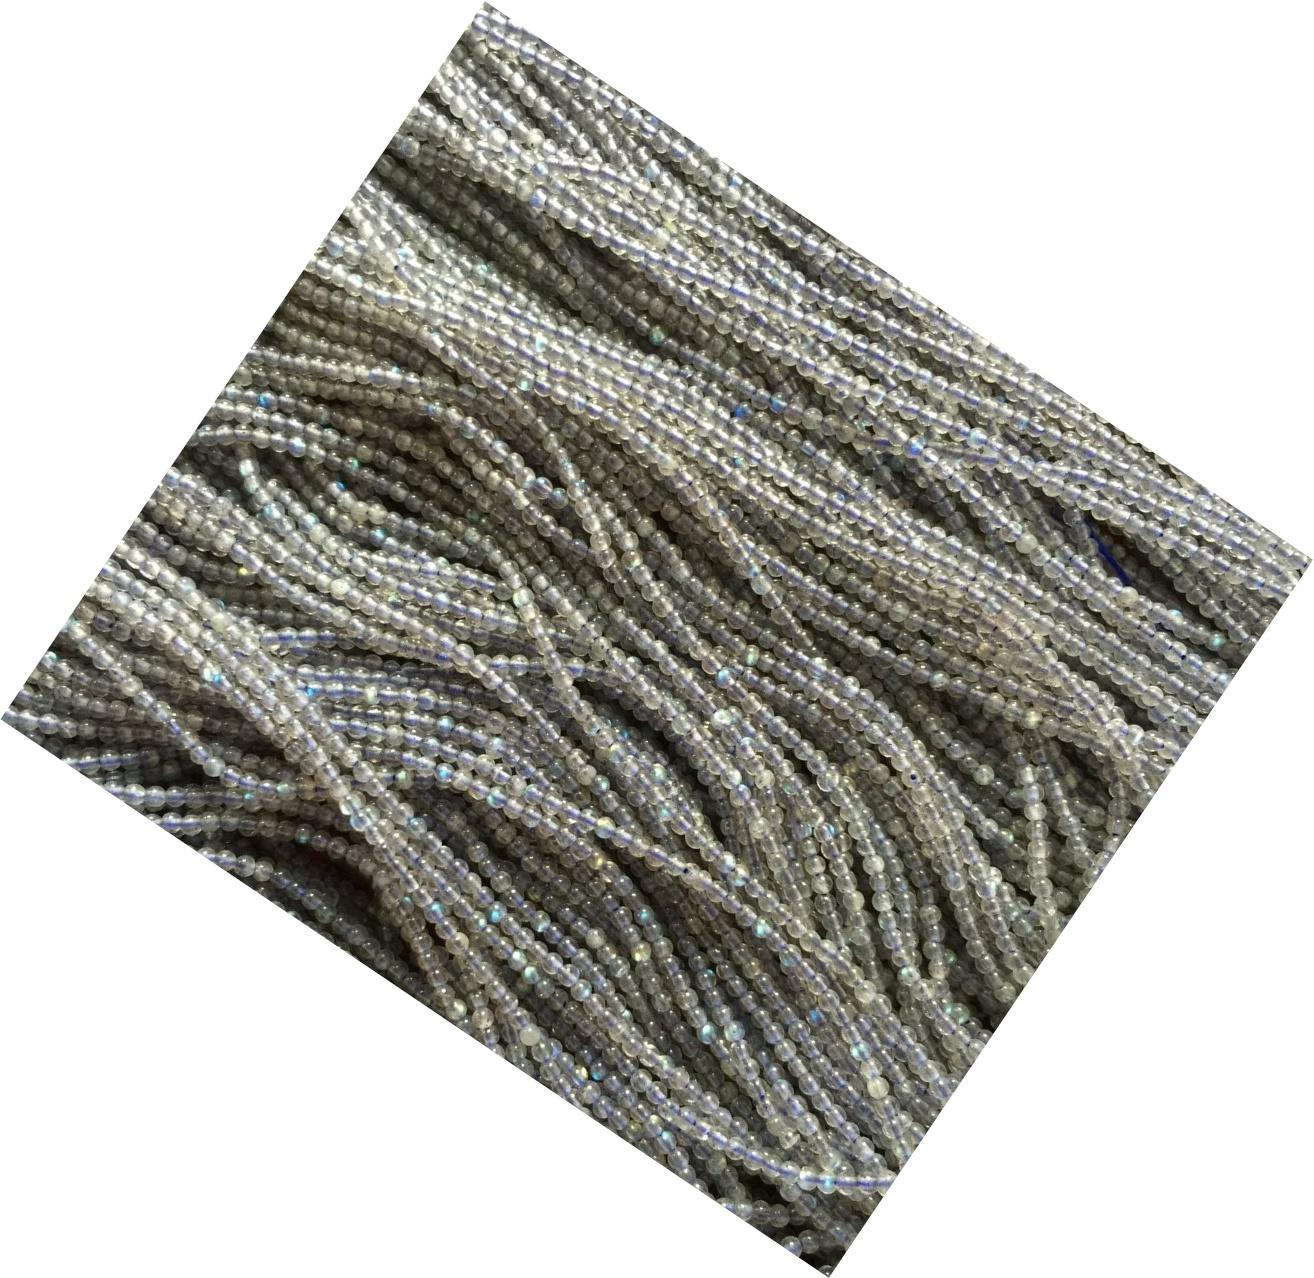 Labradorite Gemstone Blue Flash Grade 3A 4mm 5mm 6mm 7mm 8mm 9mm 10mm 11mm 12mm Round Loose Beads Full Strand